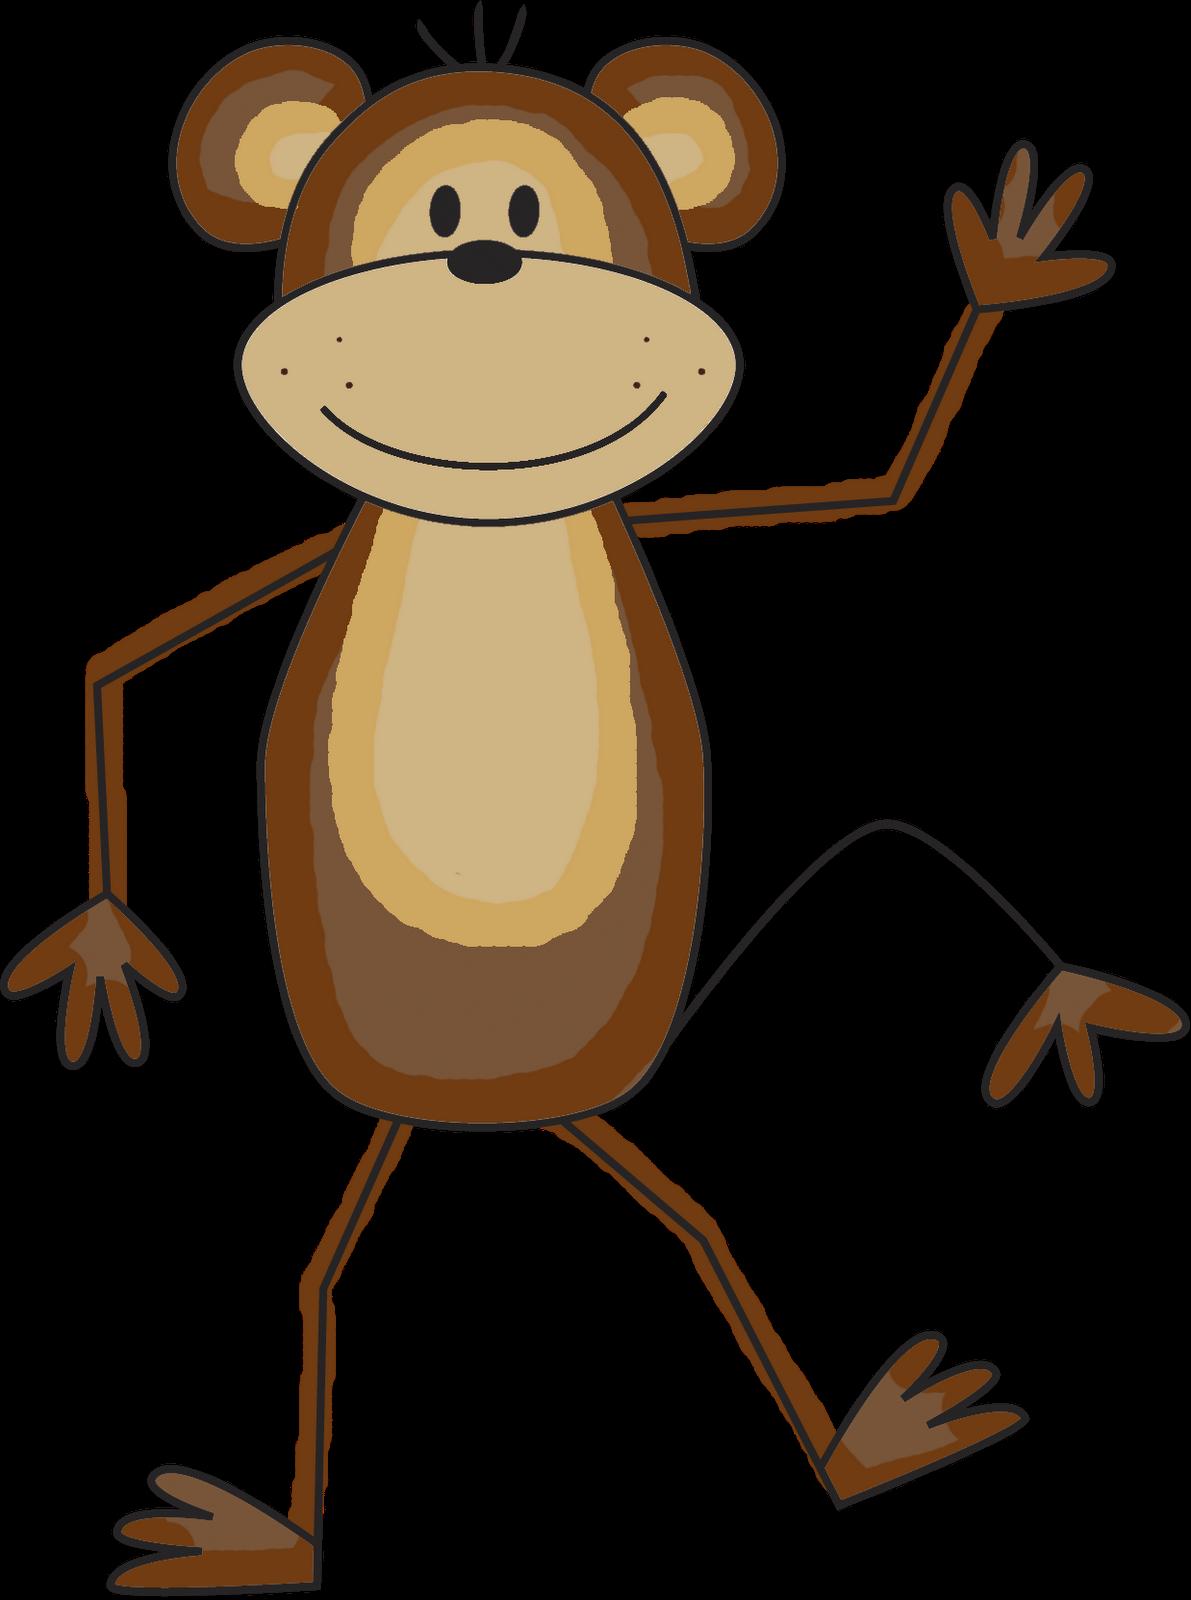 1191x1600 Cute Monkey Clipart Free